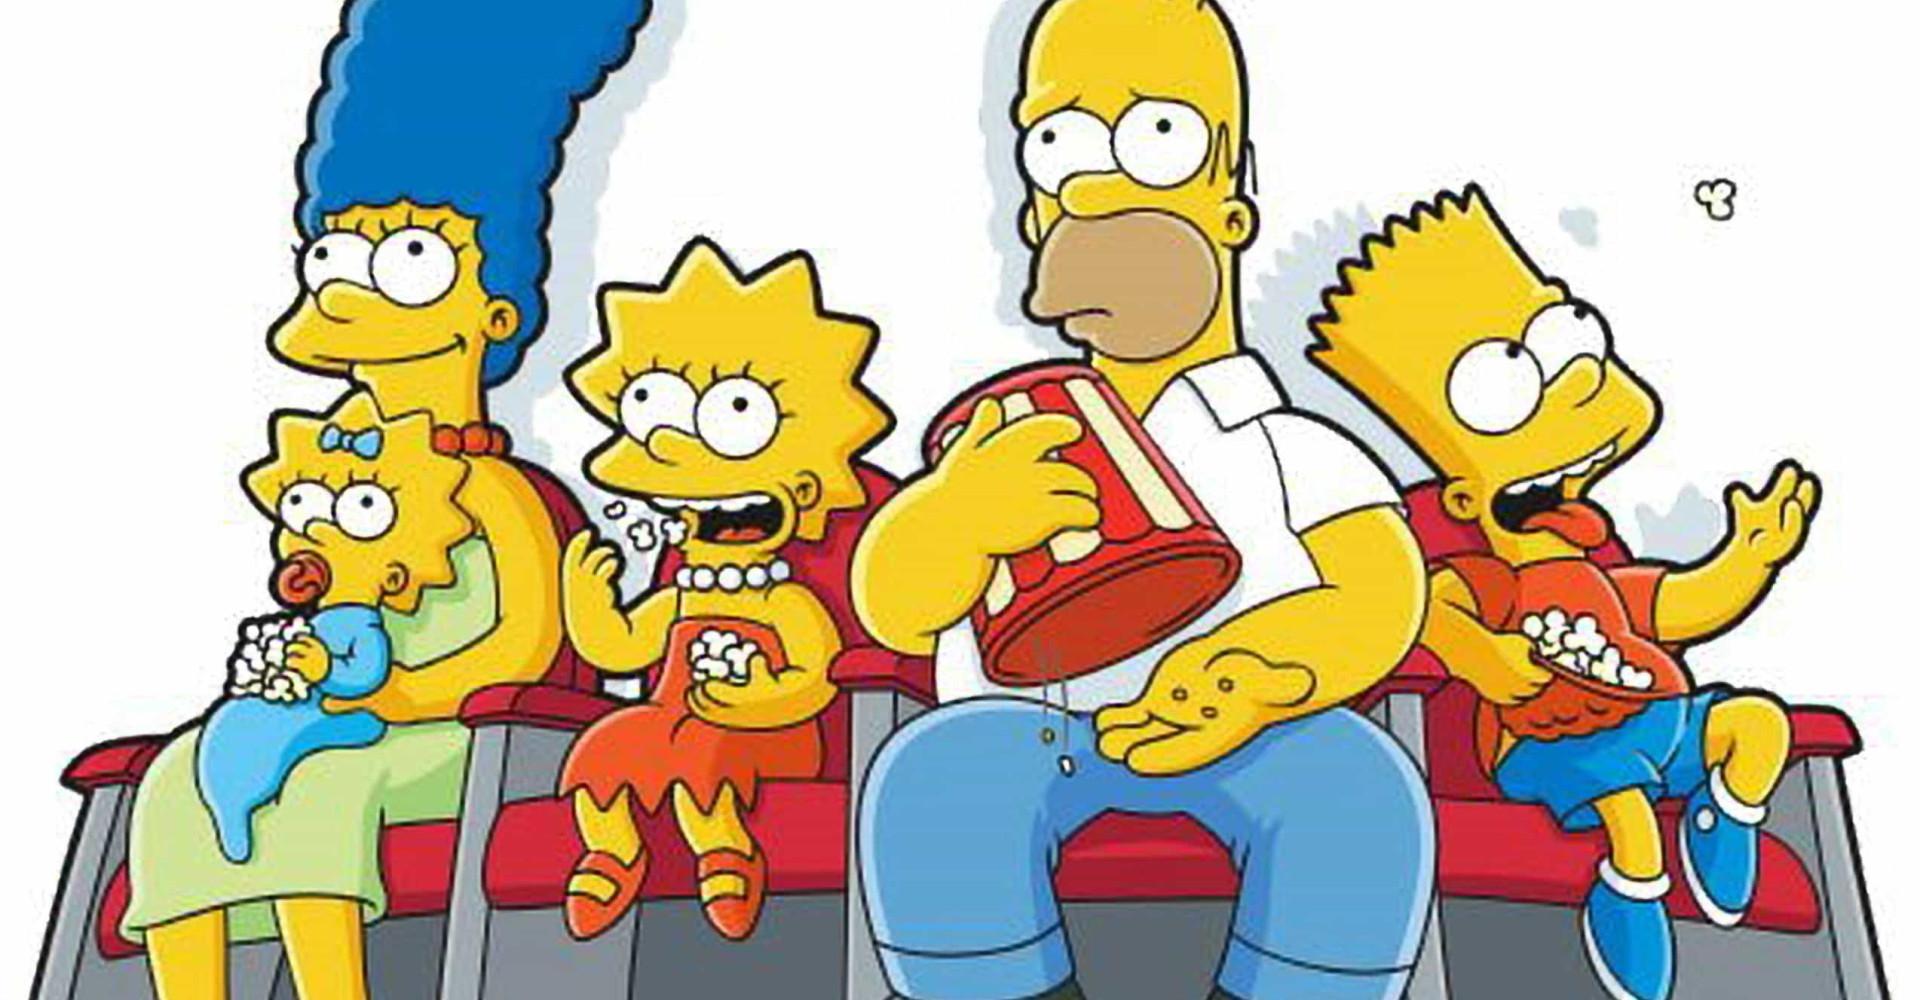 Die kontroversesten Simpsons-Momente